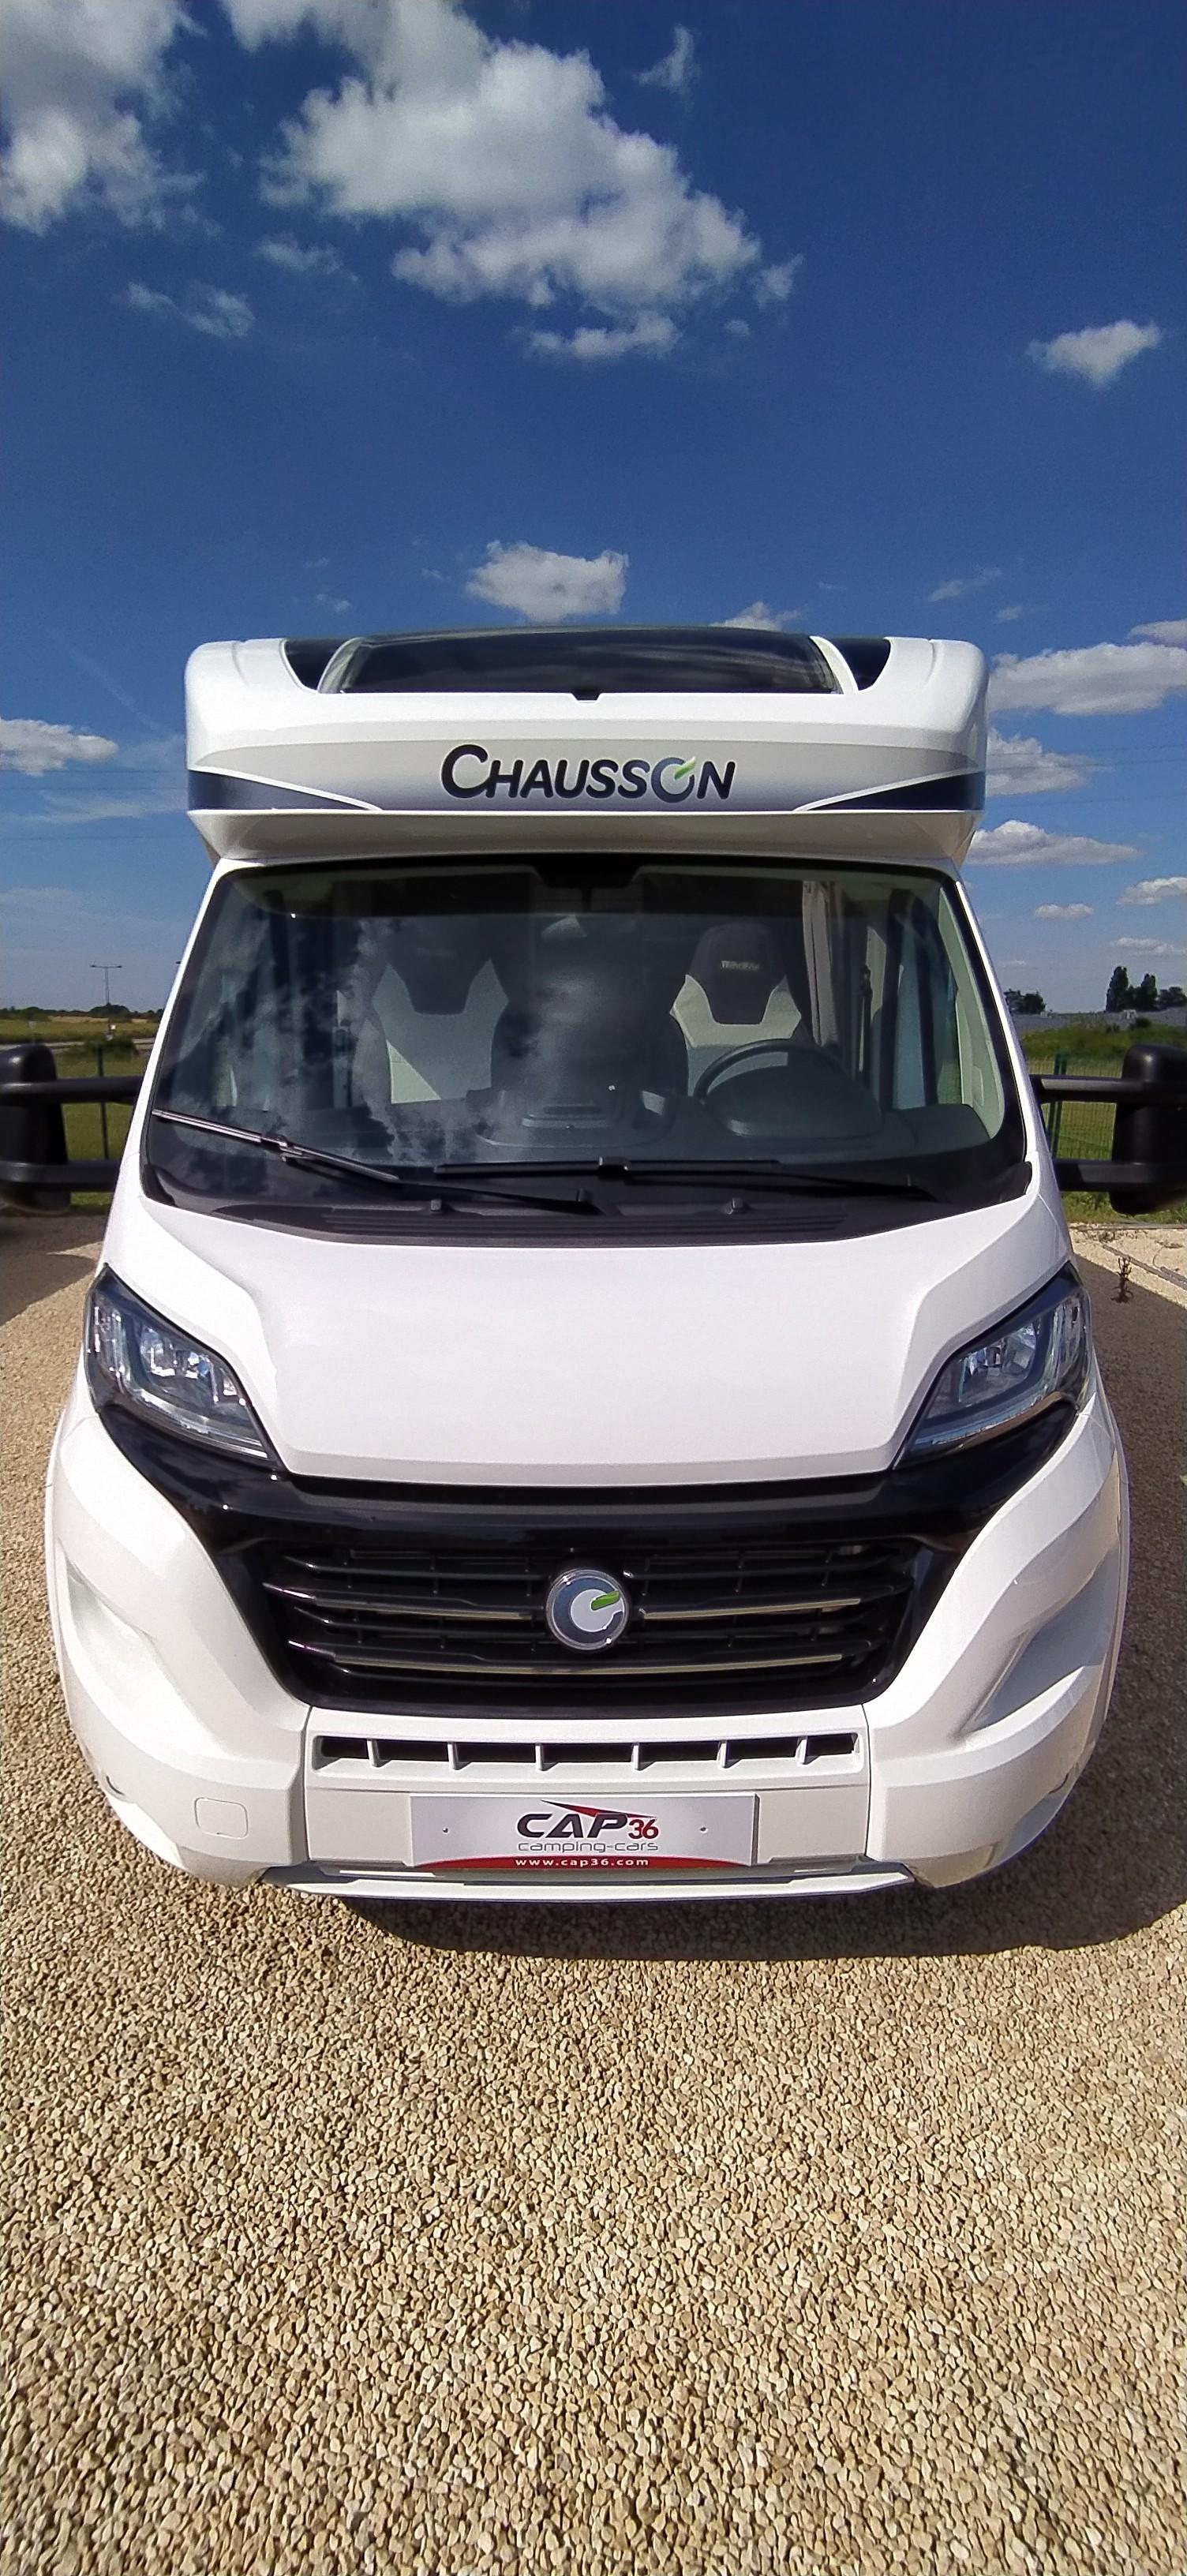 Chausson 648 Vip